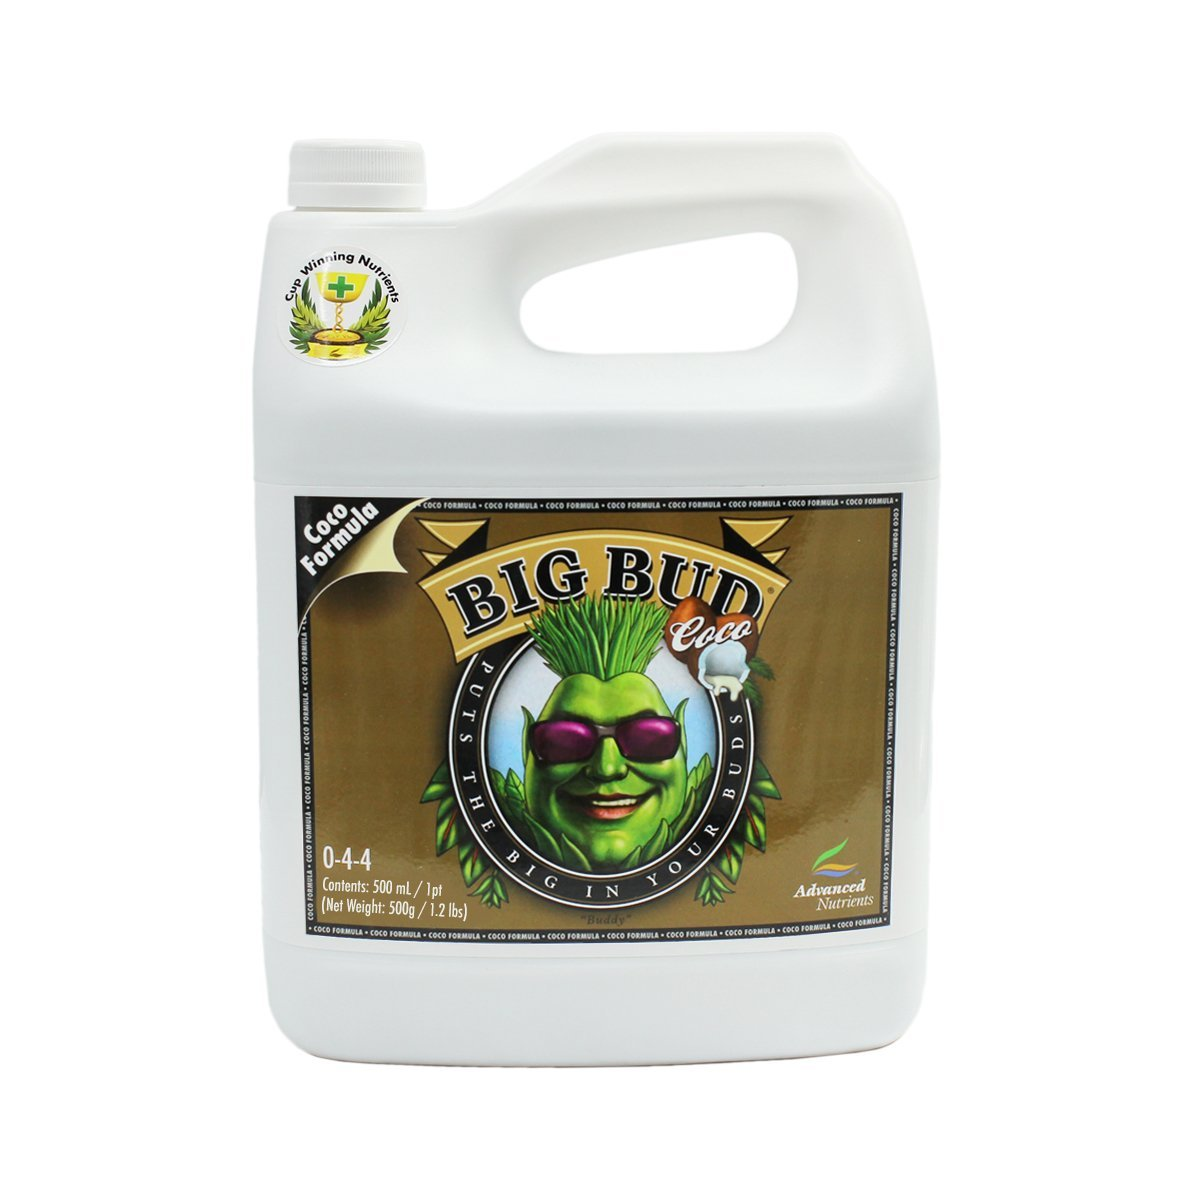 Big-Bud-Coco-1L